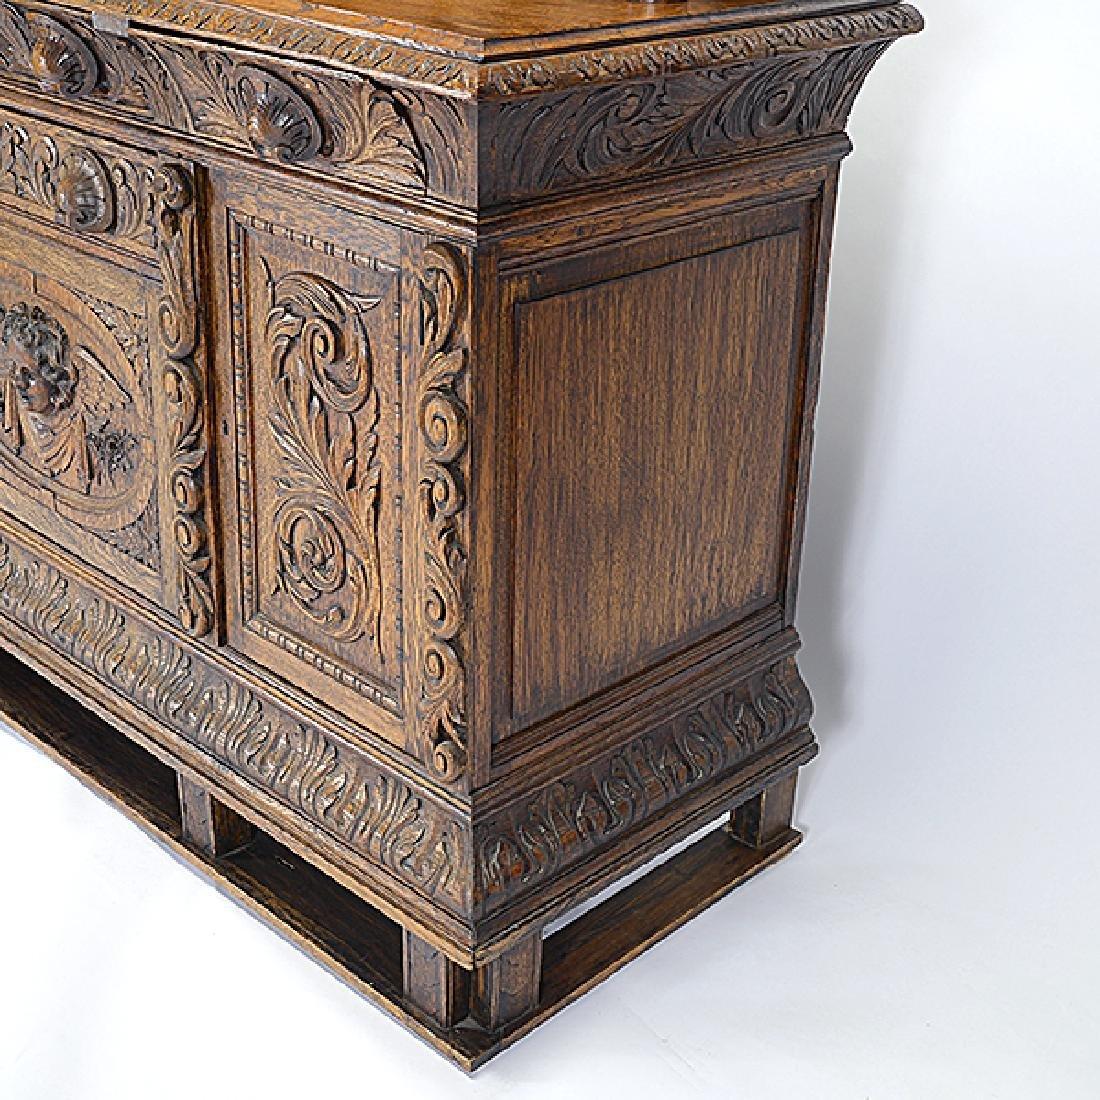 Renaissance Revival Buffet Sideboard - 5